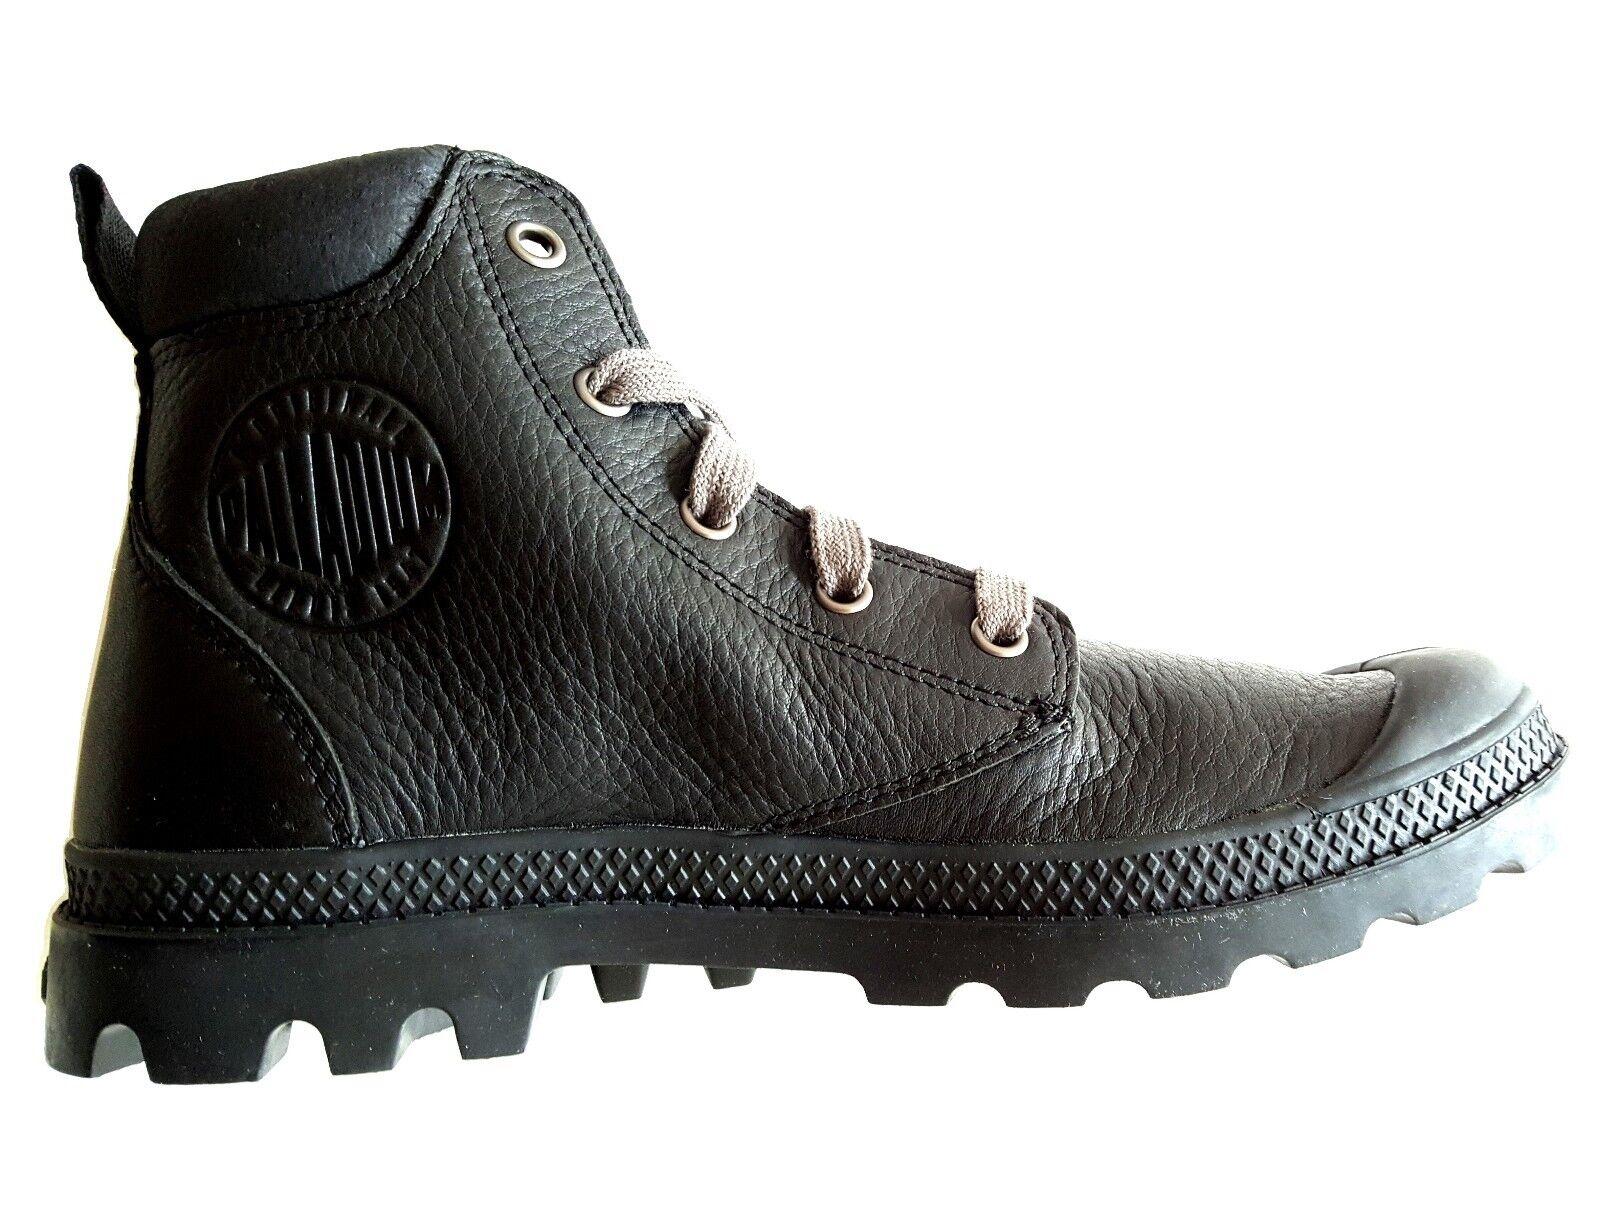 PALLADIUM Damen Stiefel Stiefel Pampa Schuhe Lederschuh Lederstiefel Stiefel Stiefel schwarz 37 8ba6e7